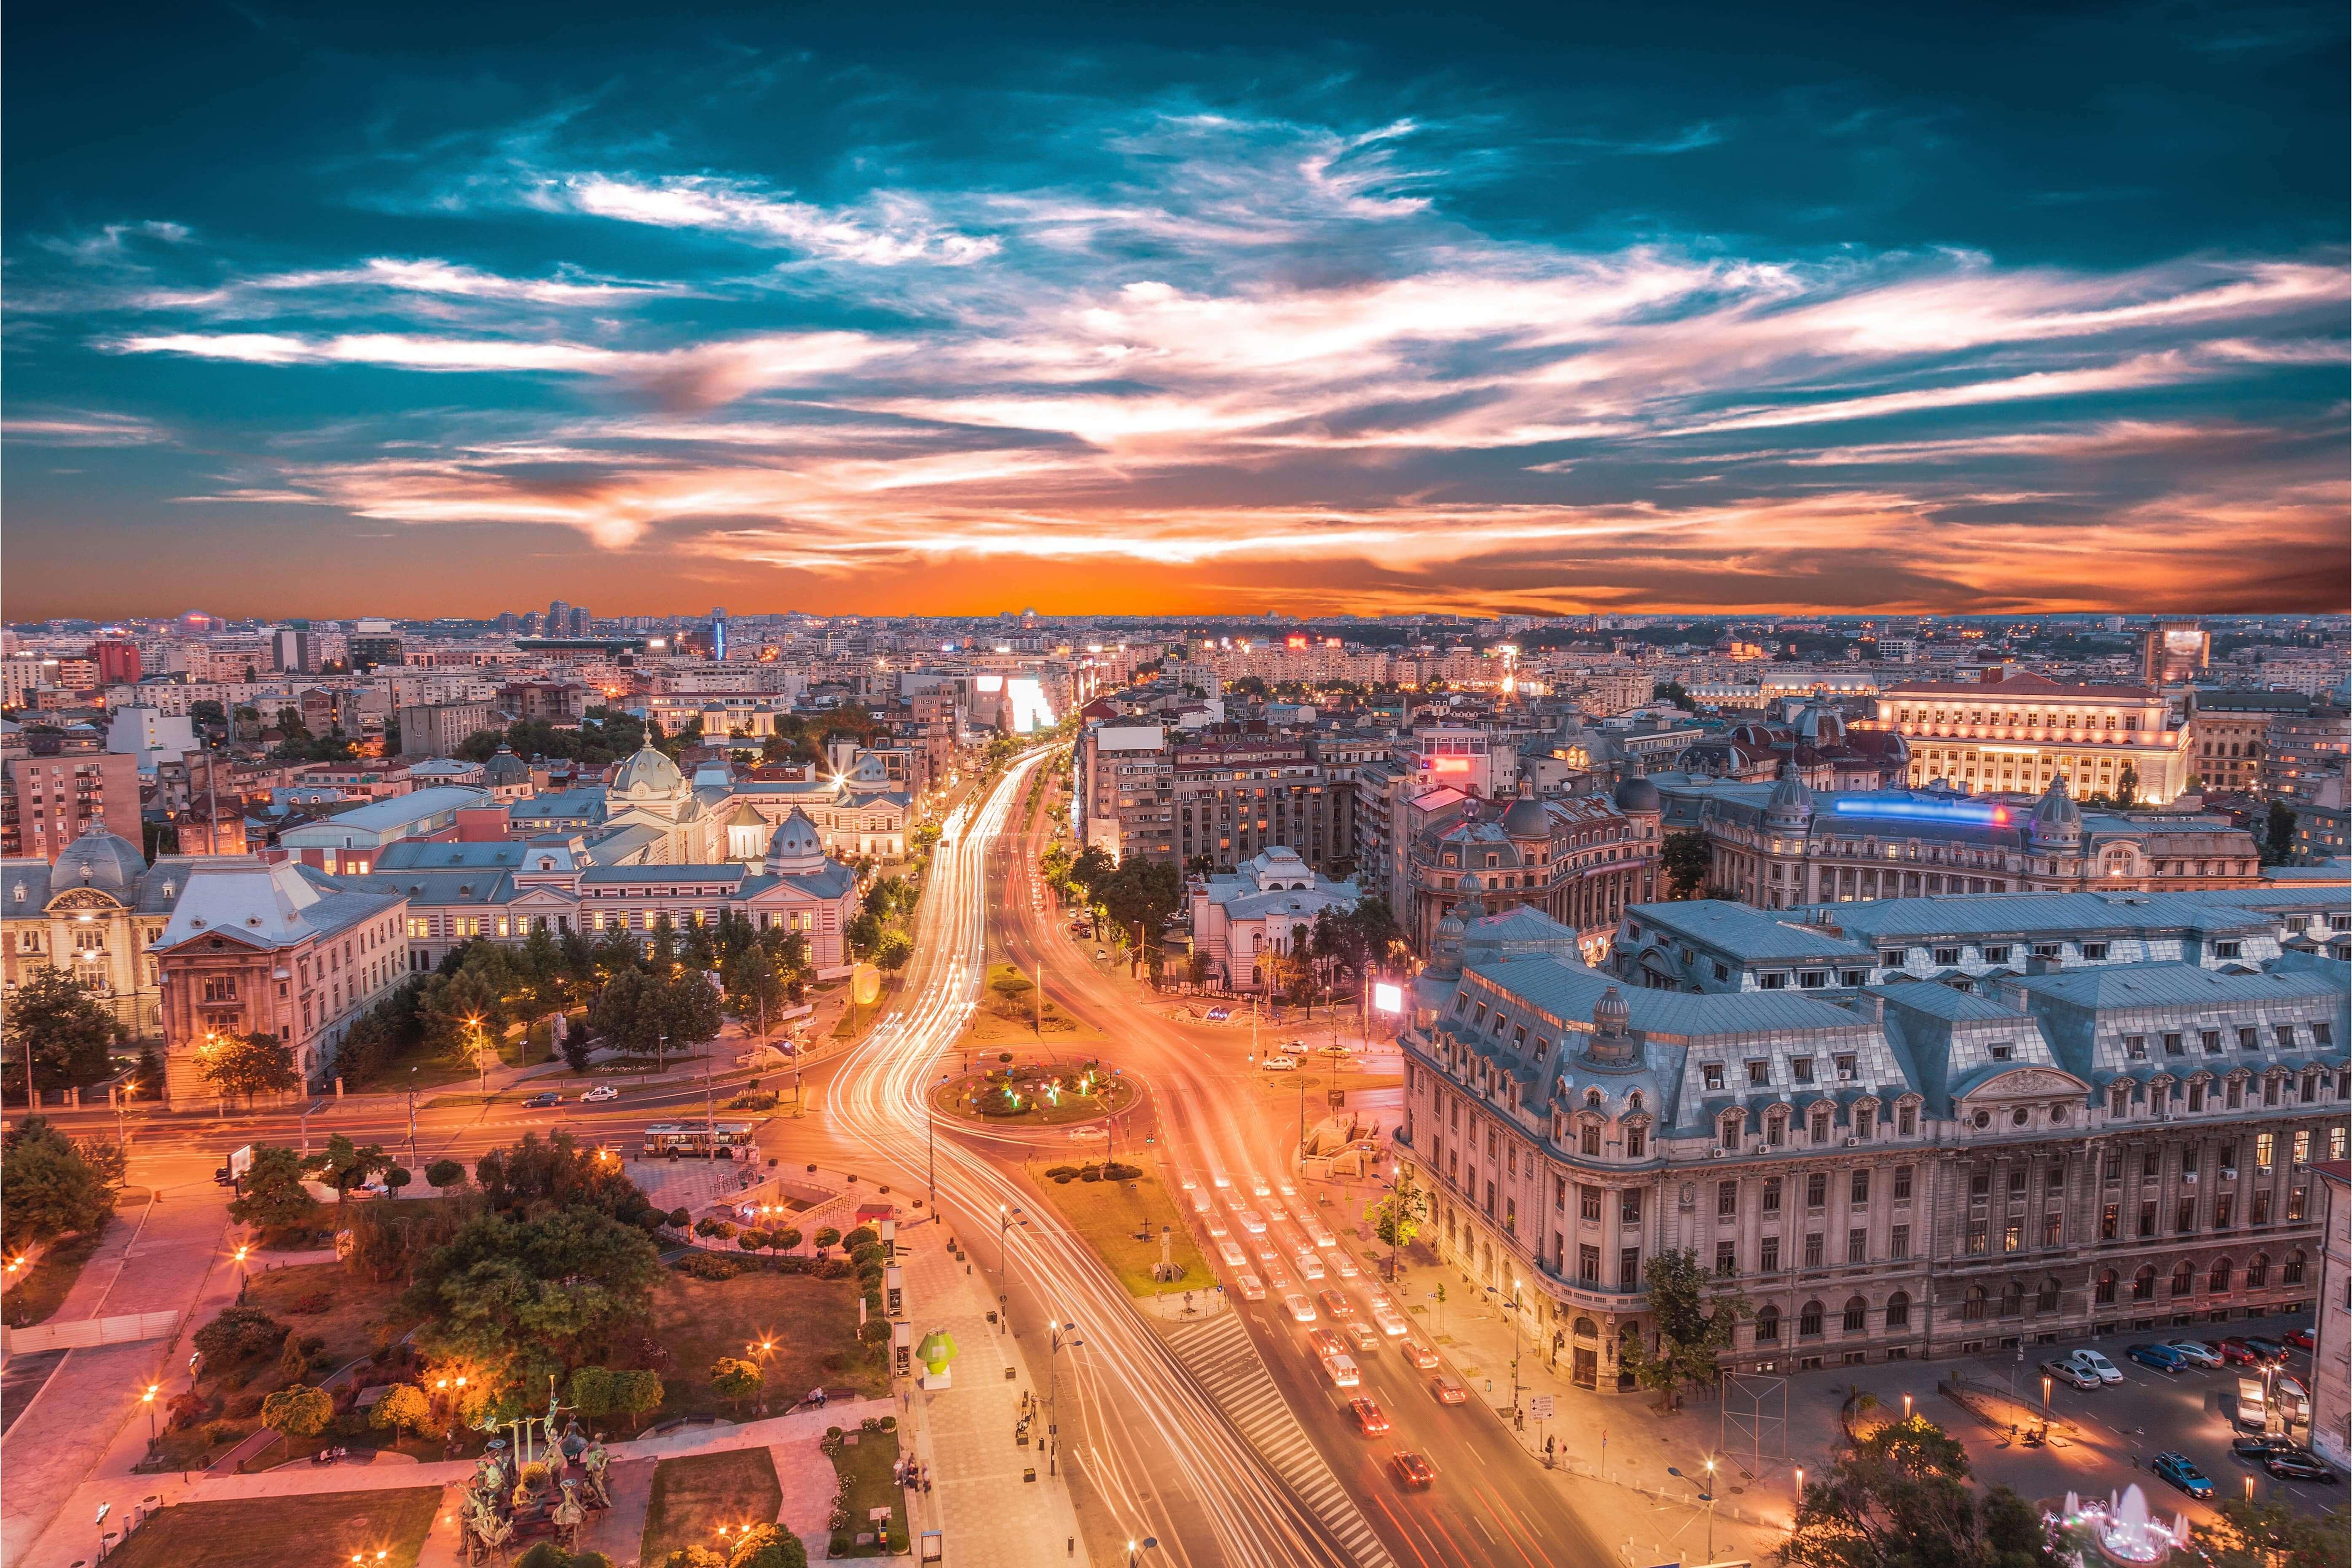 A photo of Bucharest